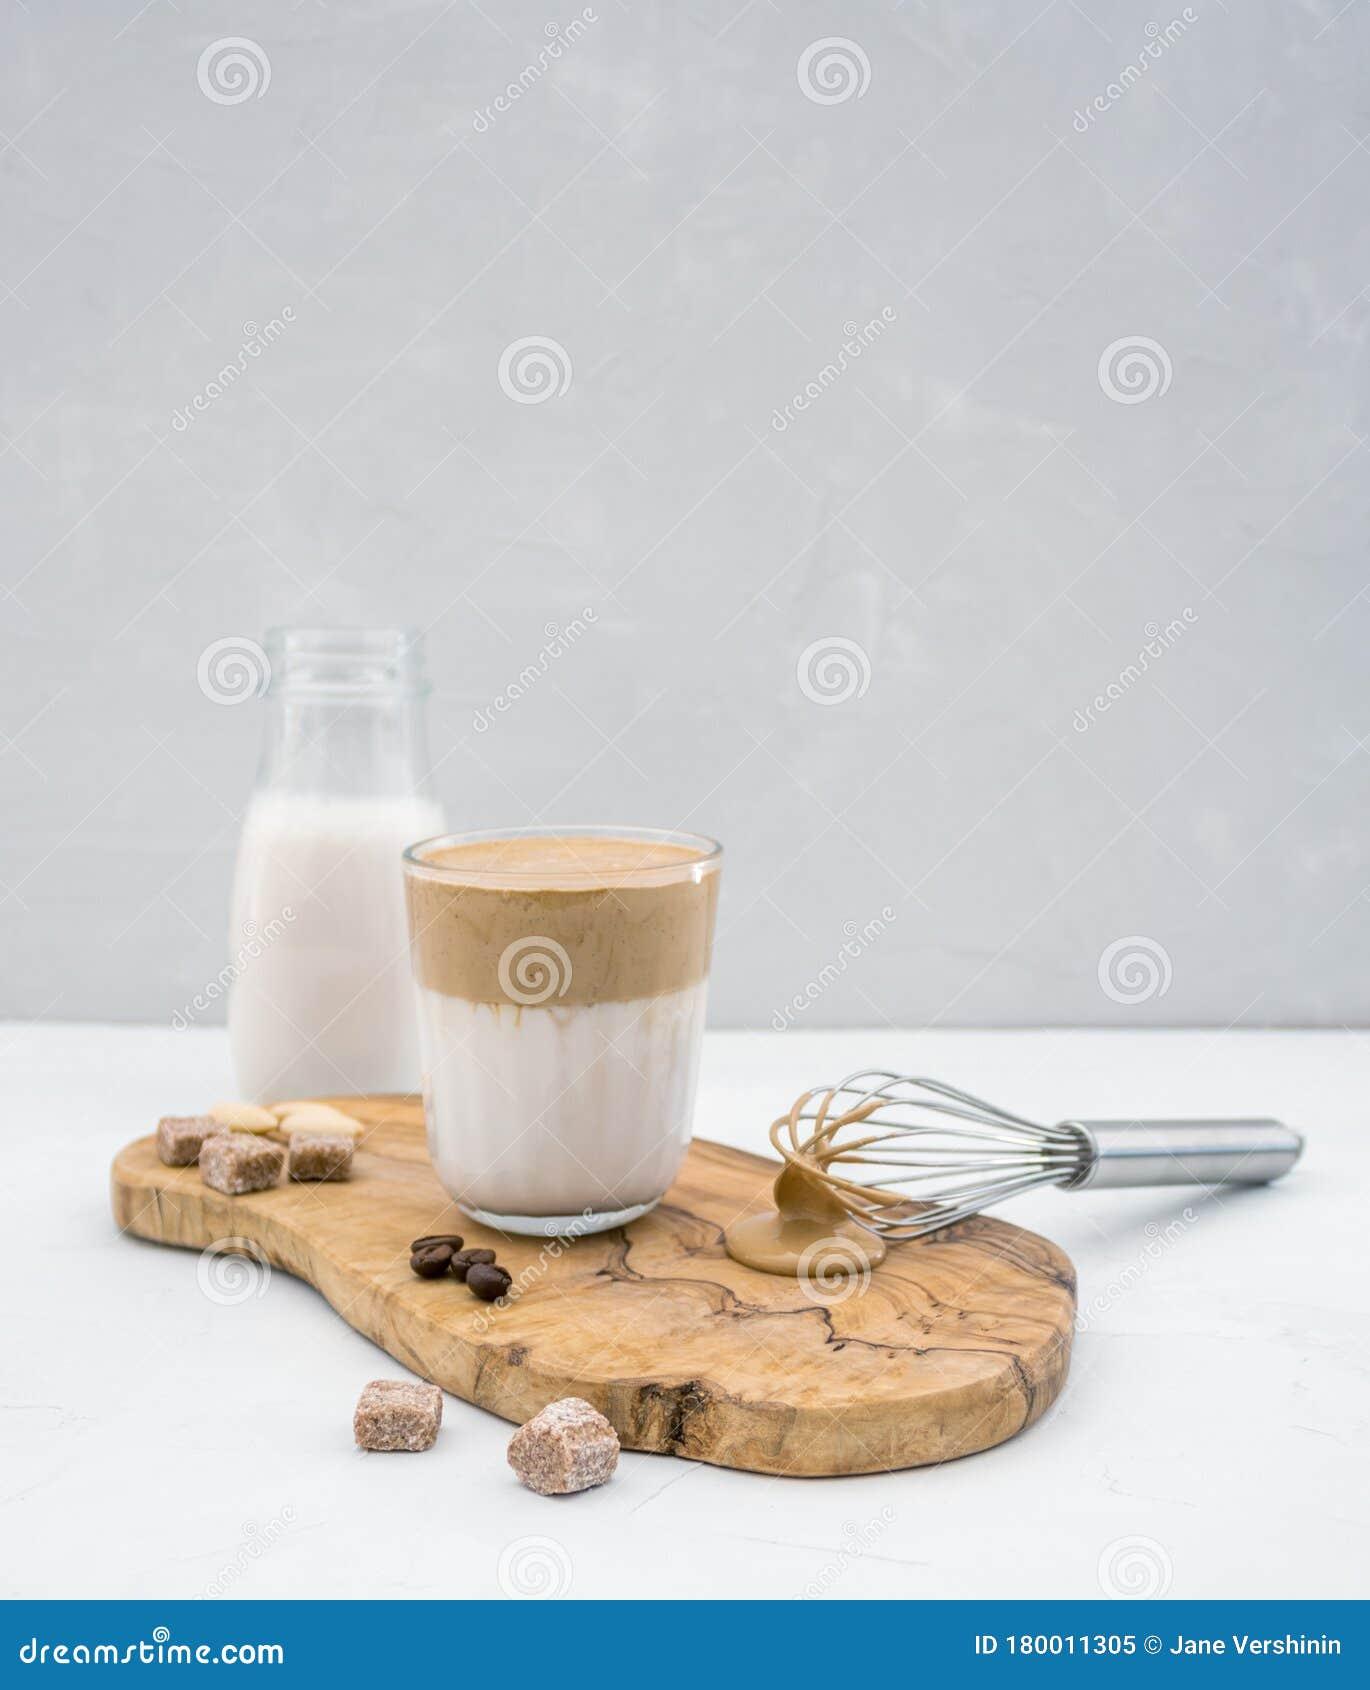 Homemade Korean Whipping Coffee Dalgona From Almond Milk ...